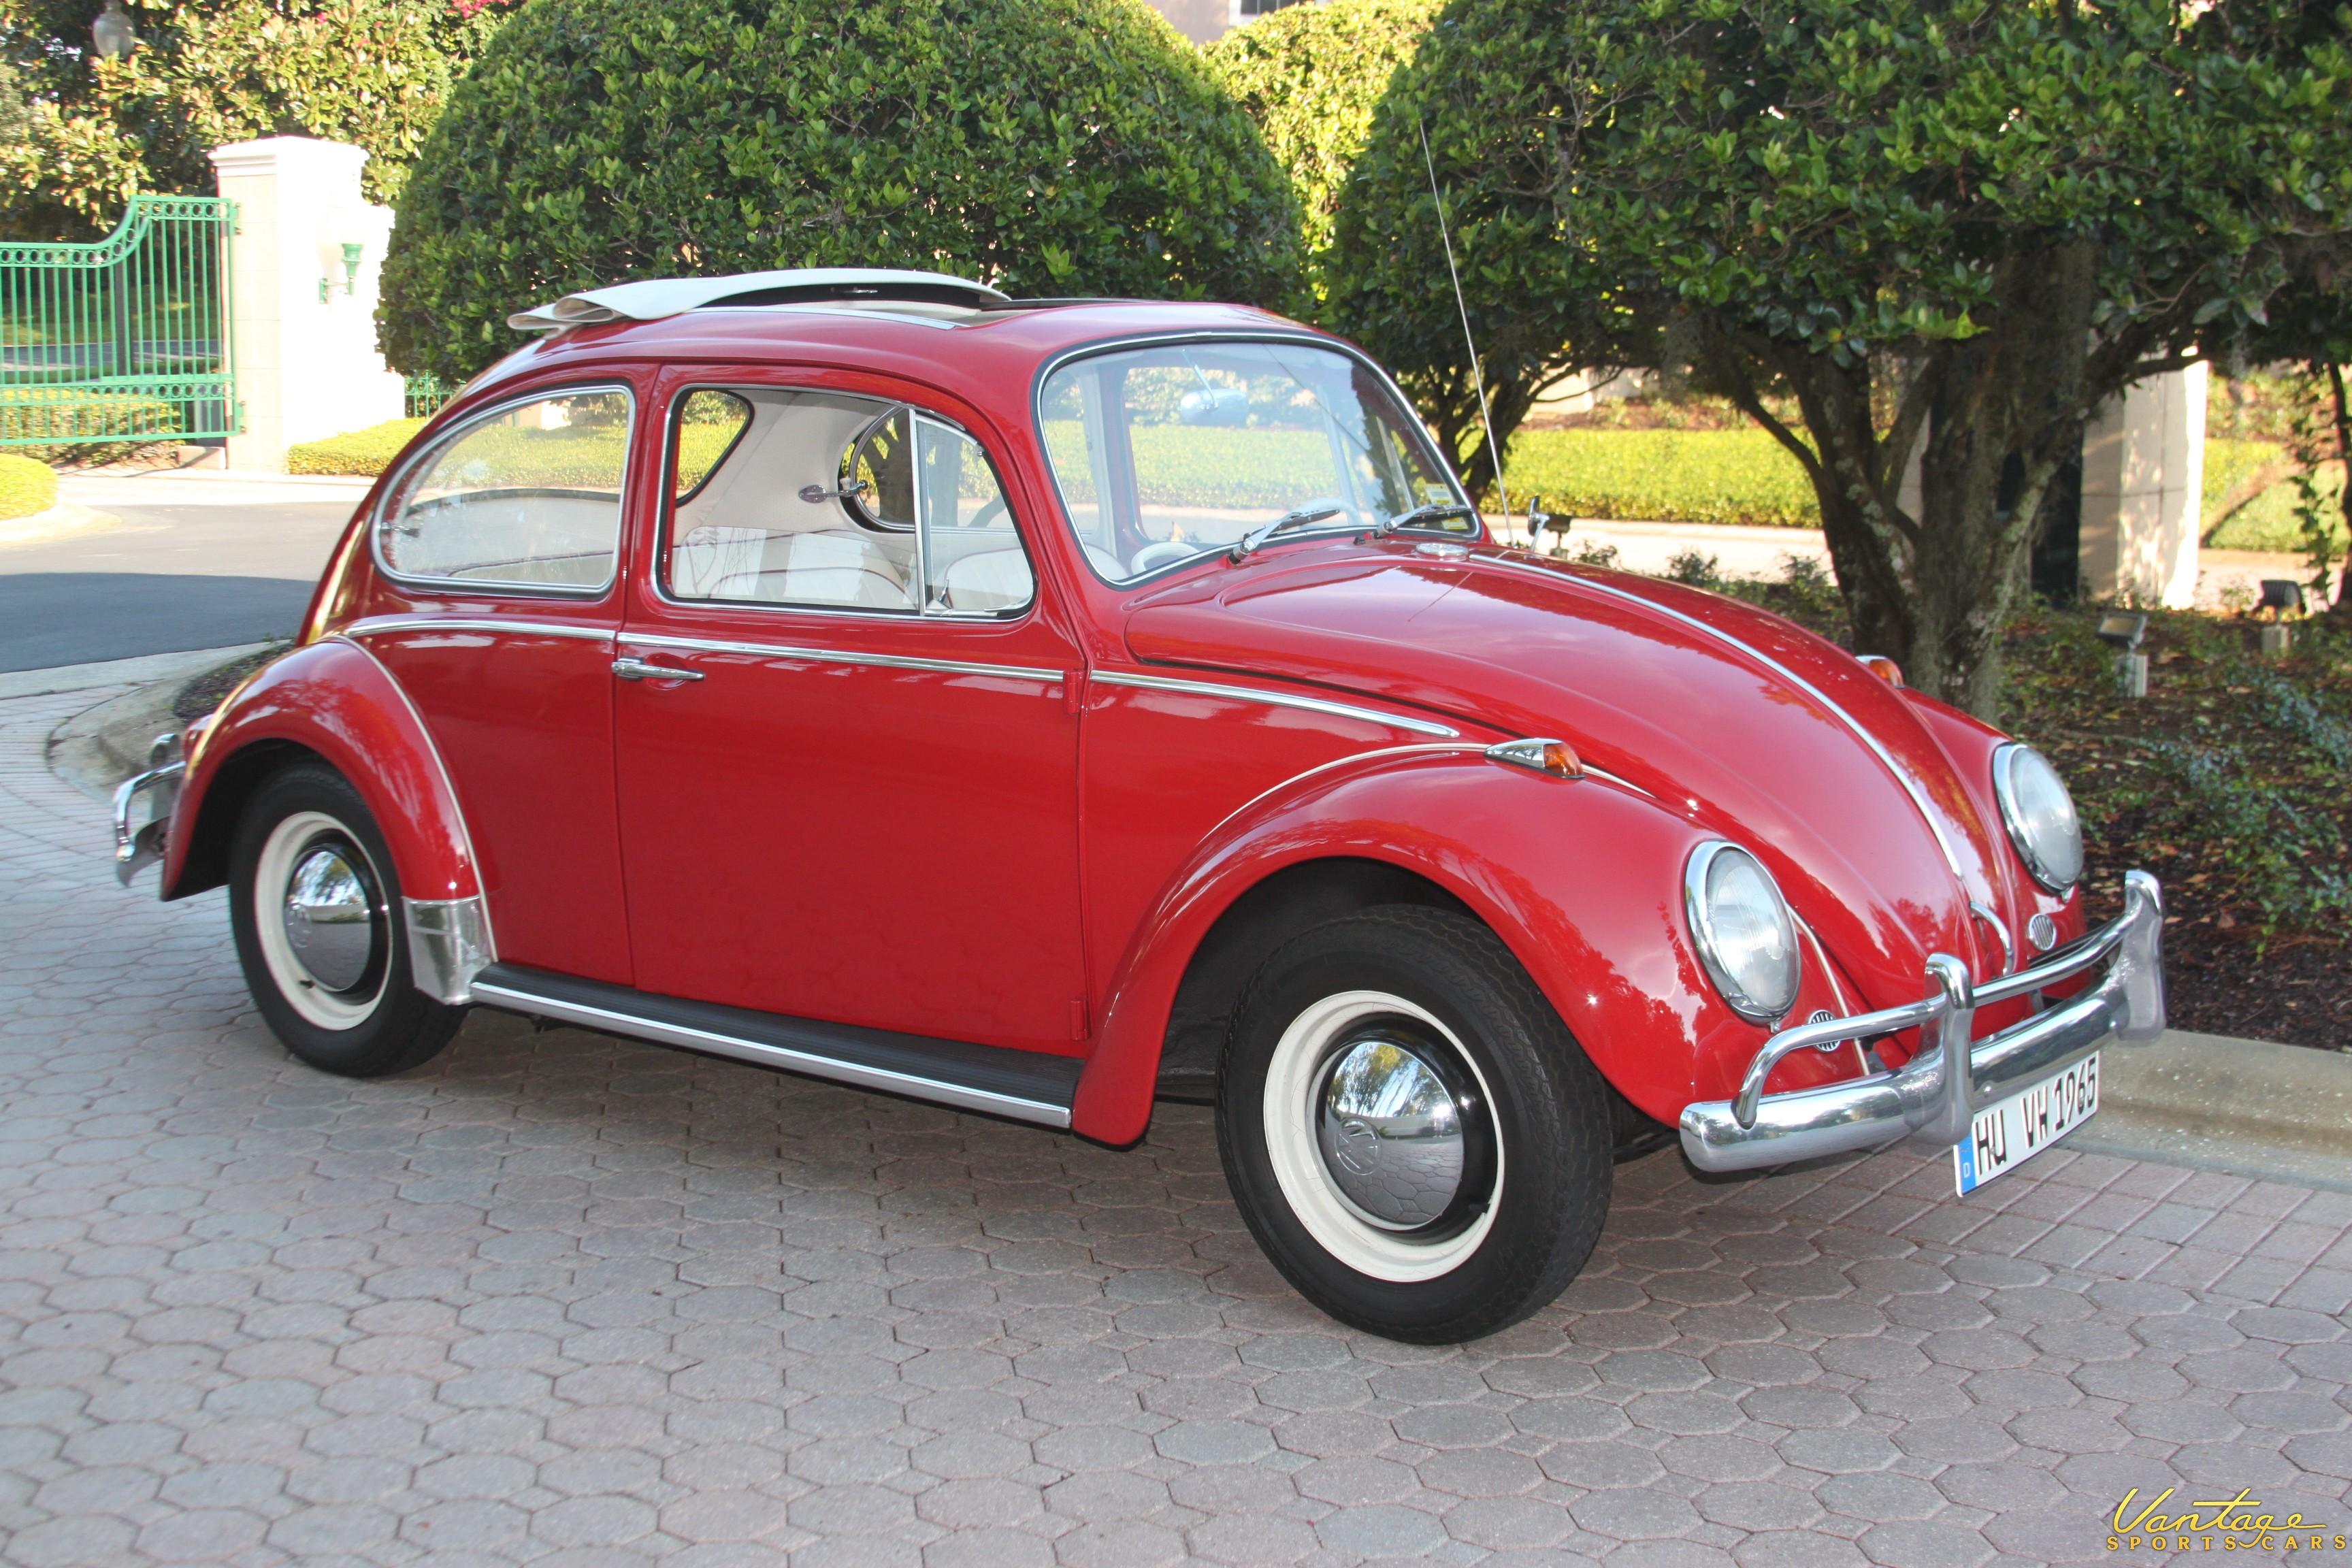 1965 Volkswagen Beetle Sold Vantage Sports Cars Vantage Sports Cars